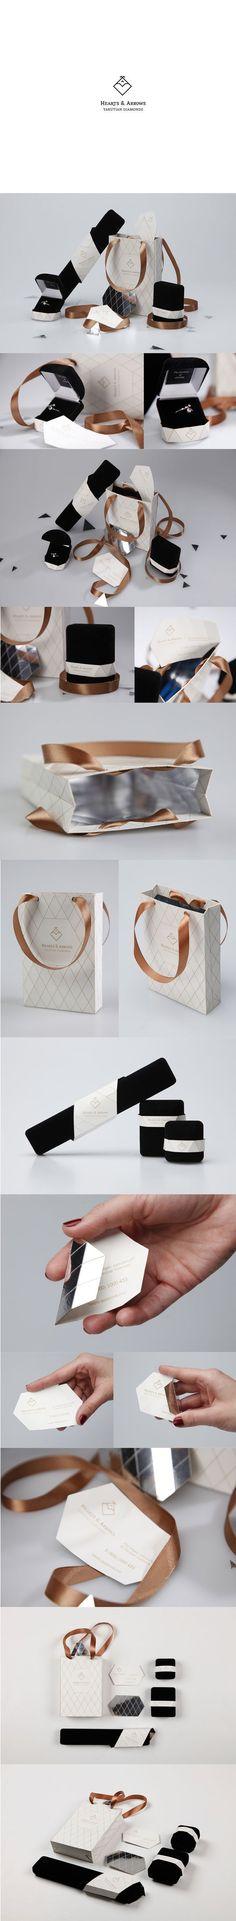 Hearts & Arrows by Kir Rostovsky #packaging #branding #marketing PD